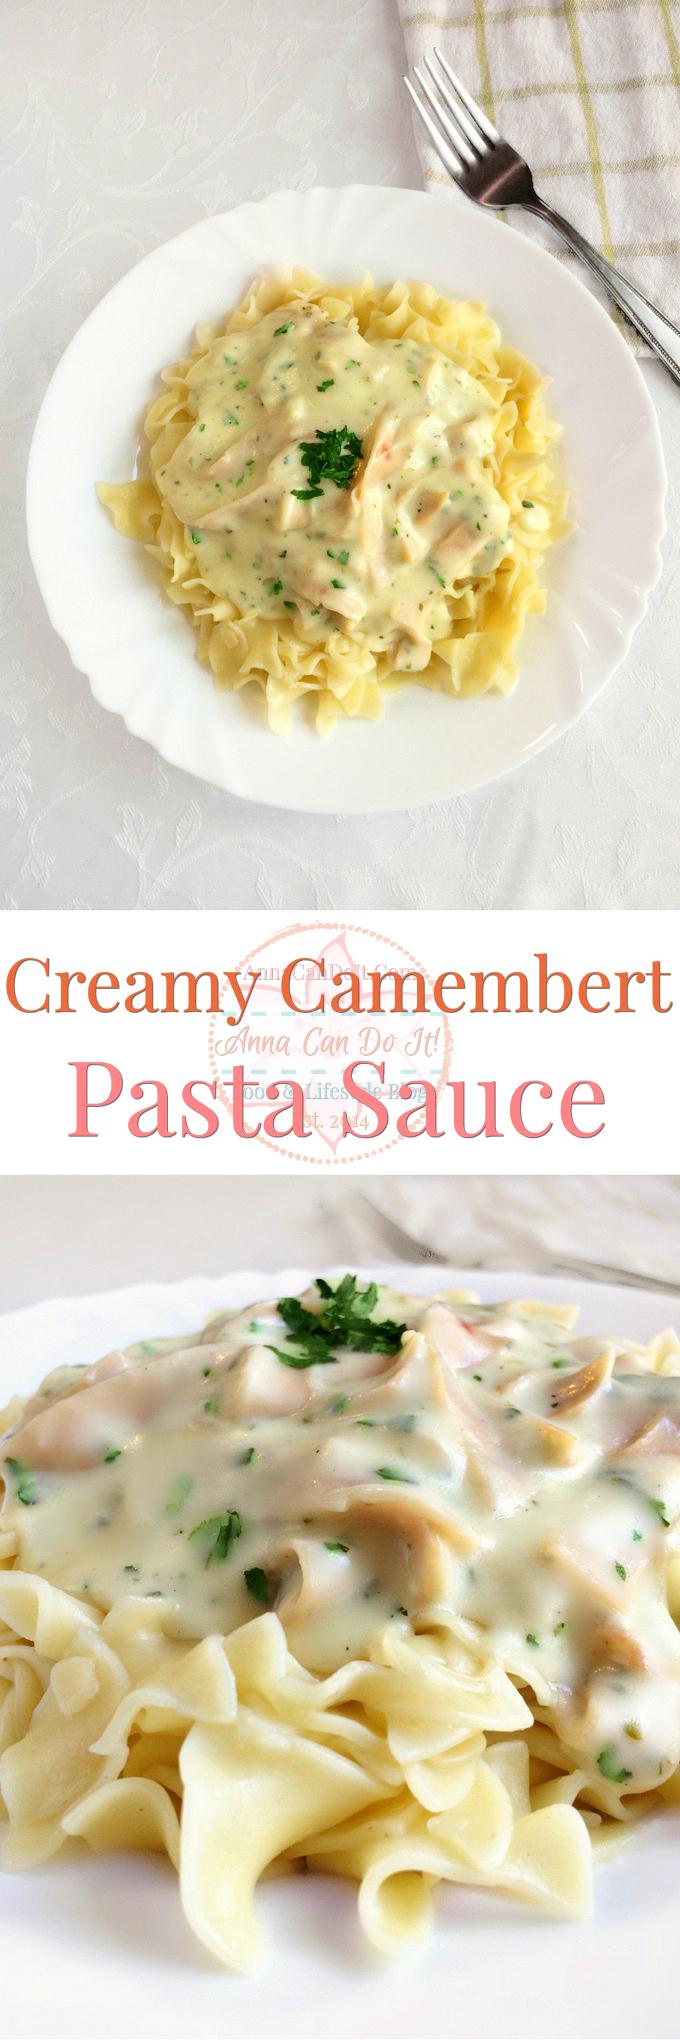 Creamy Camembert Pasta Sauce - Anna Can Do It!